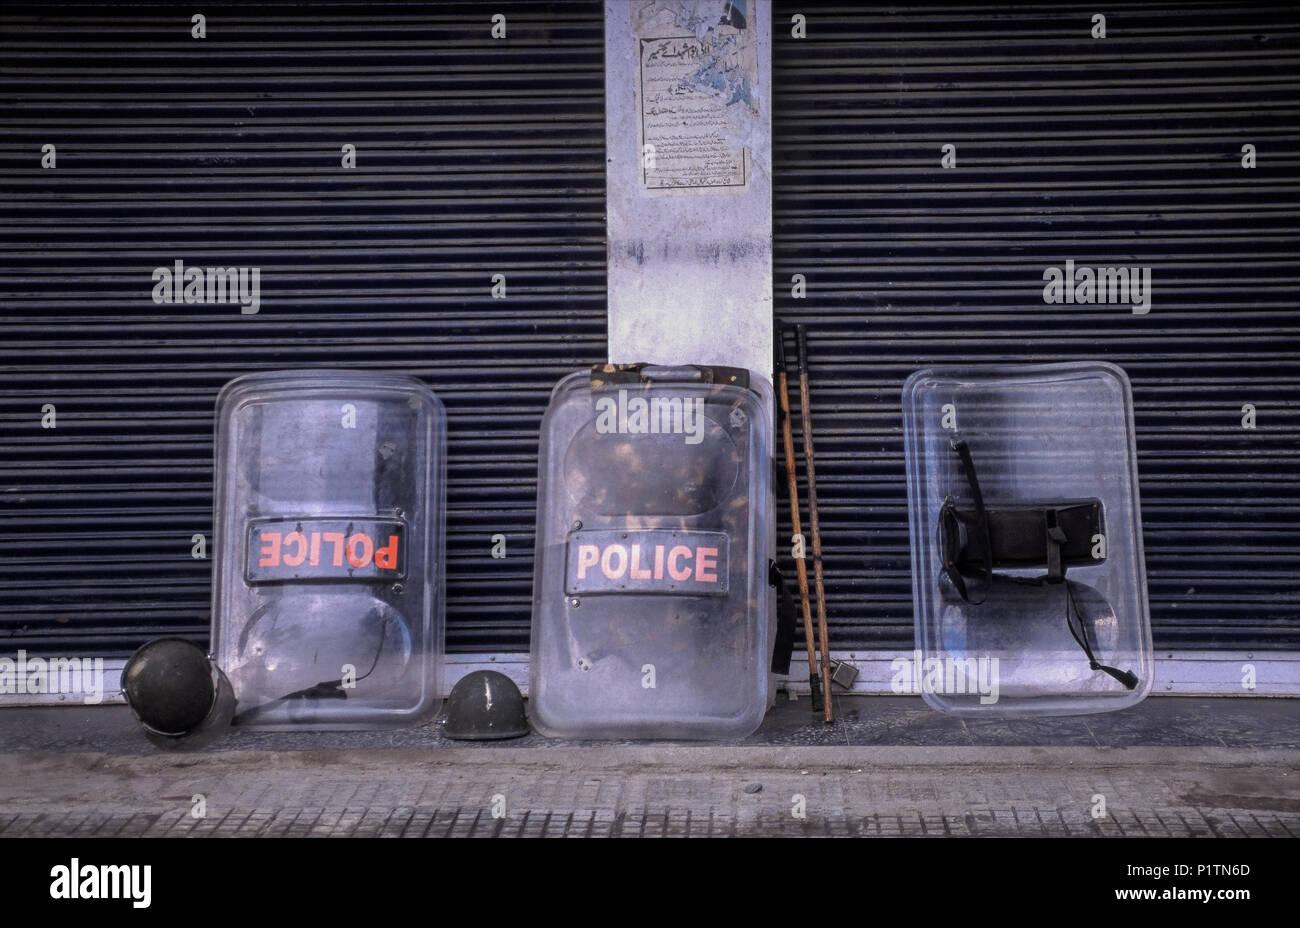 Srinagar, India, deposited protective equipment of the Indian Paramilita - Stock Image